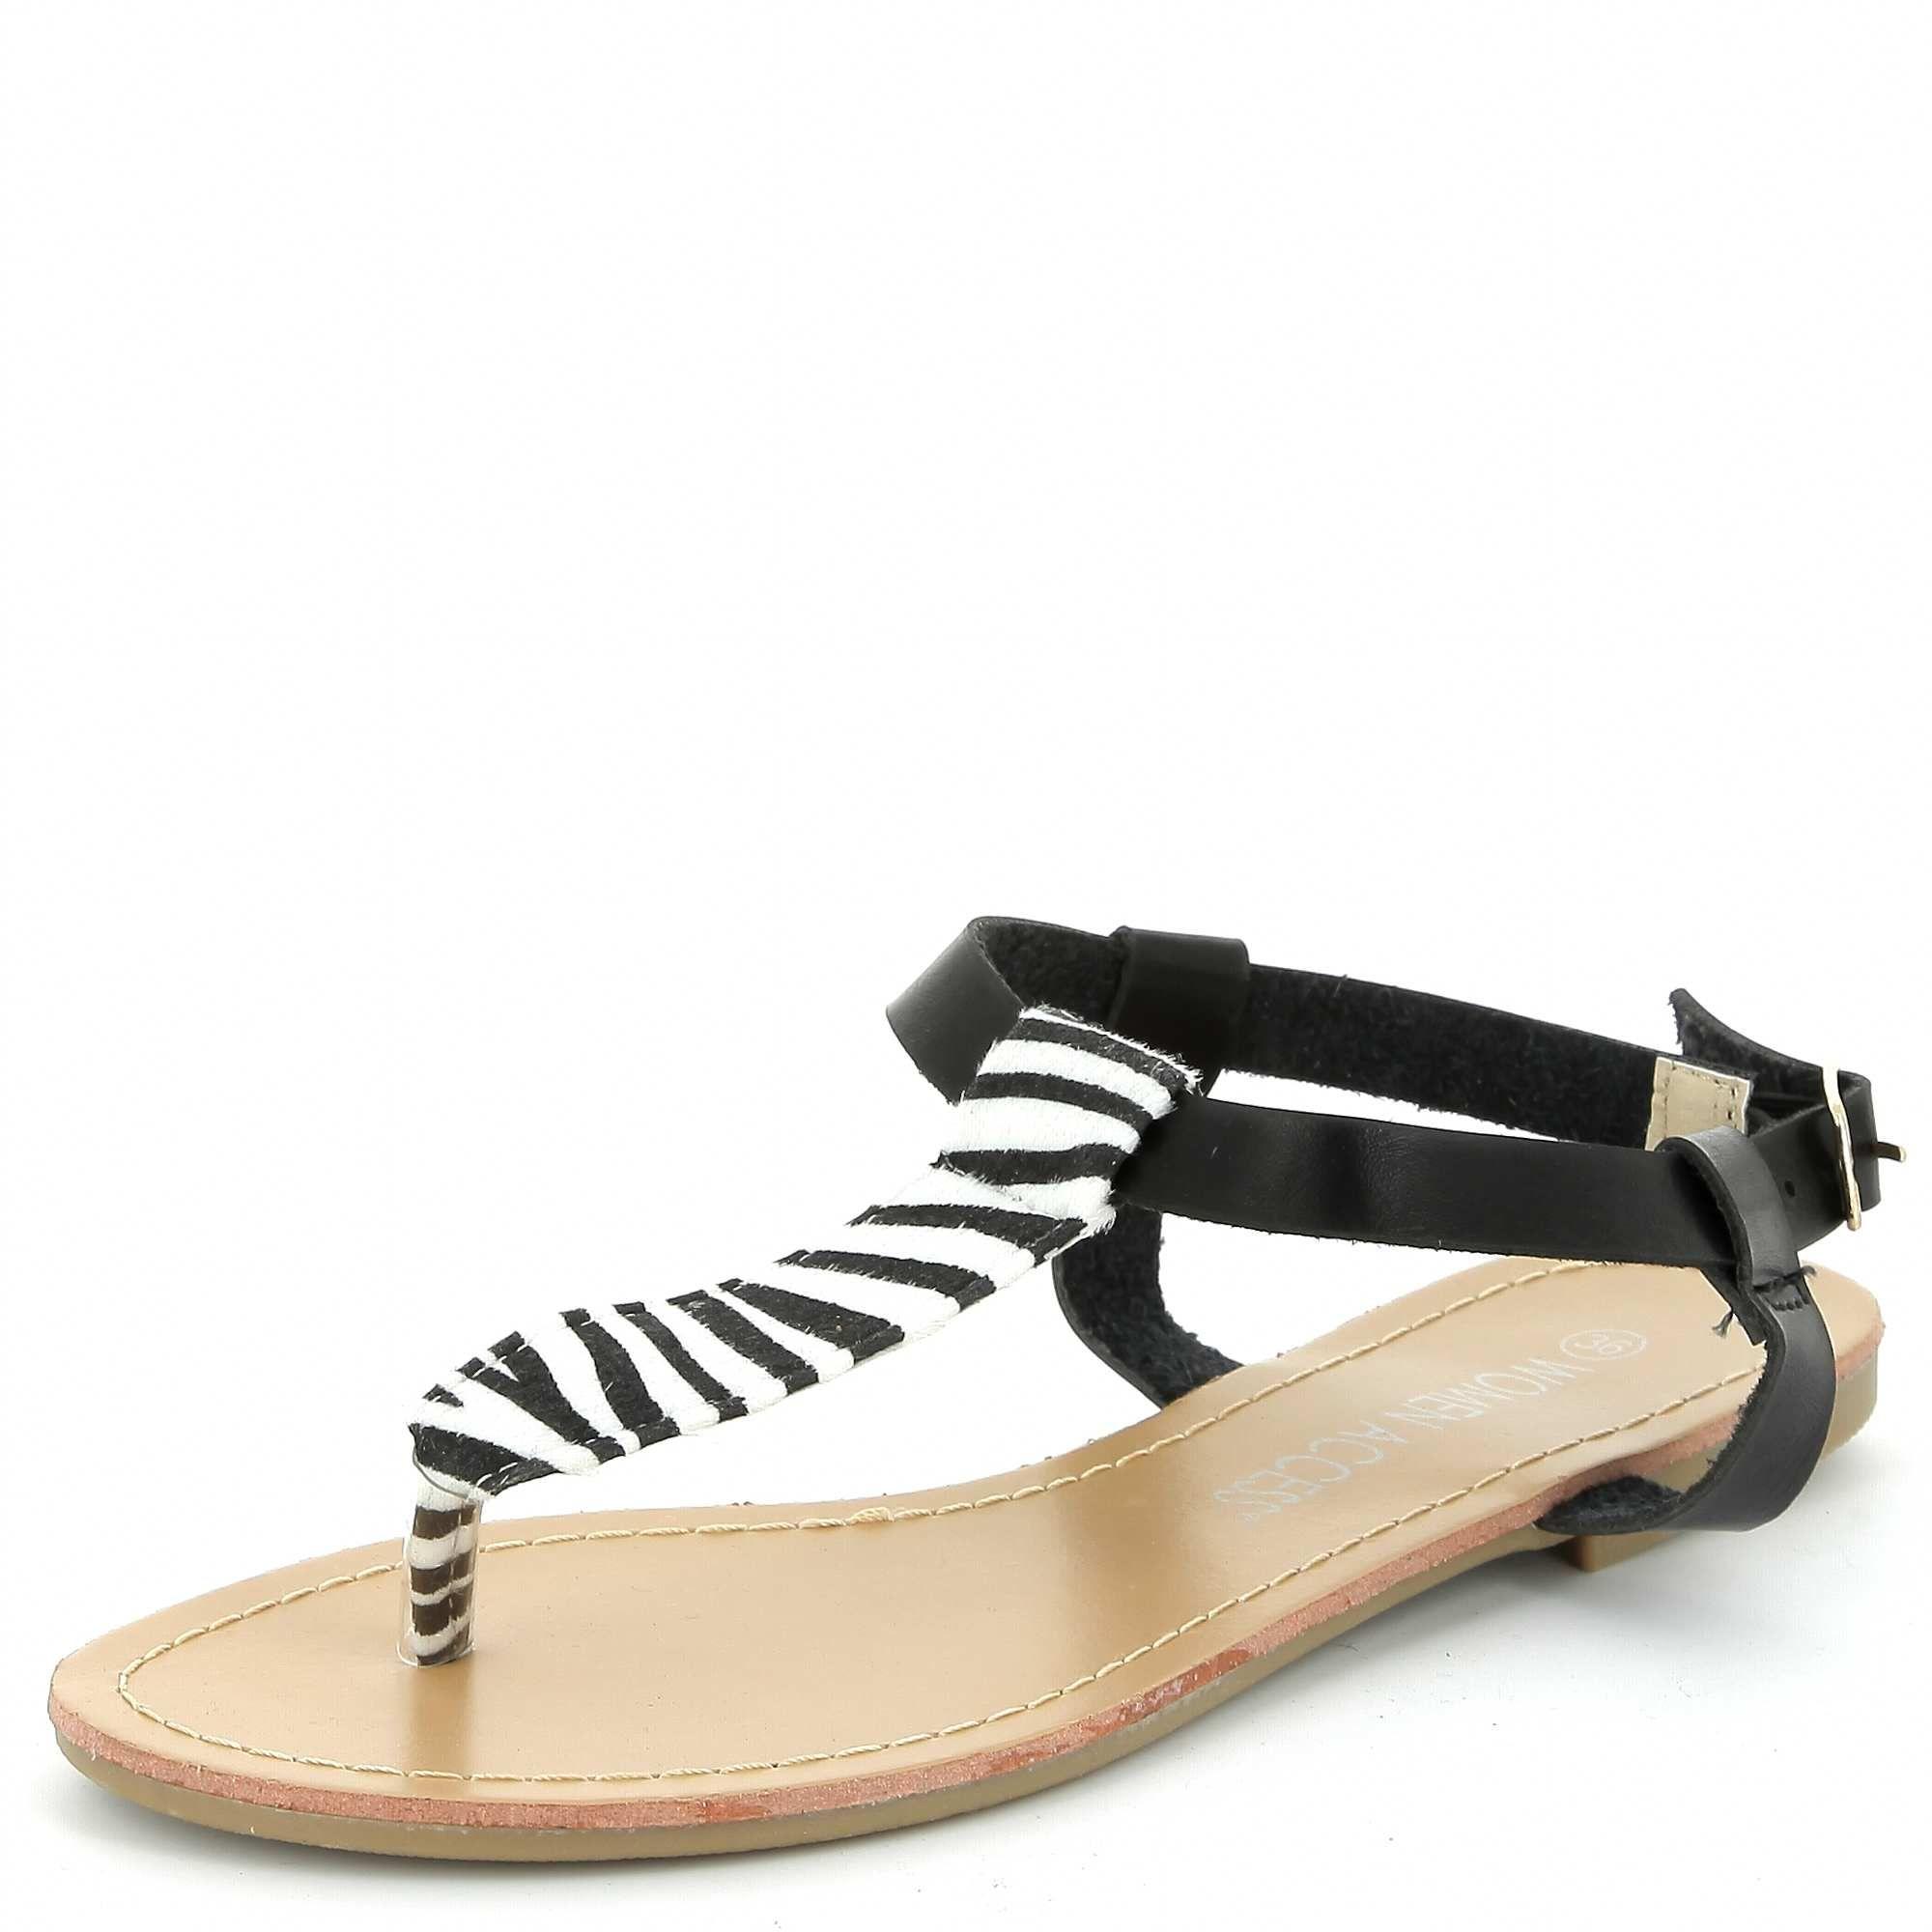 220f1d728 Sandalias de leopardo NOIR  Mujer